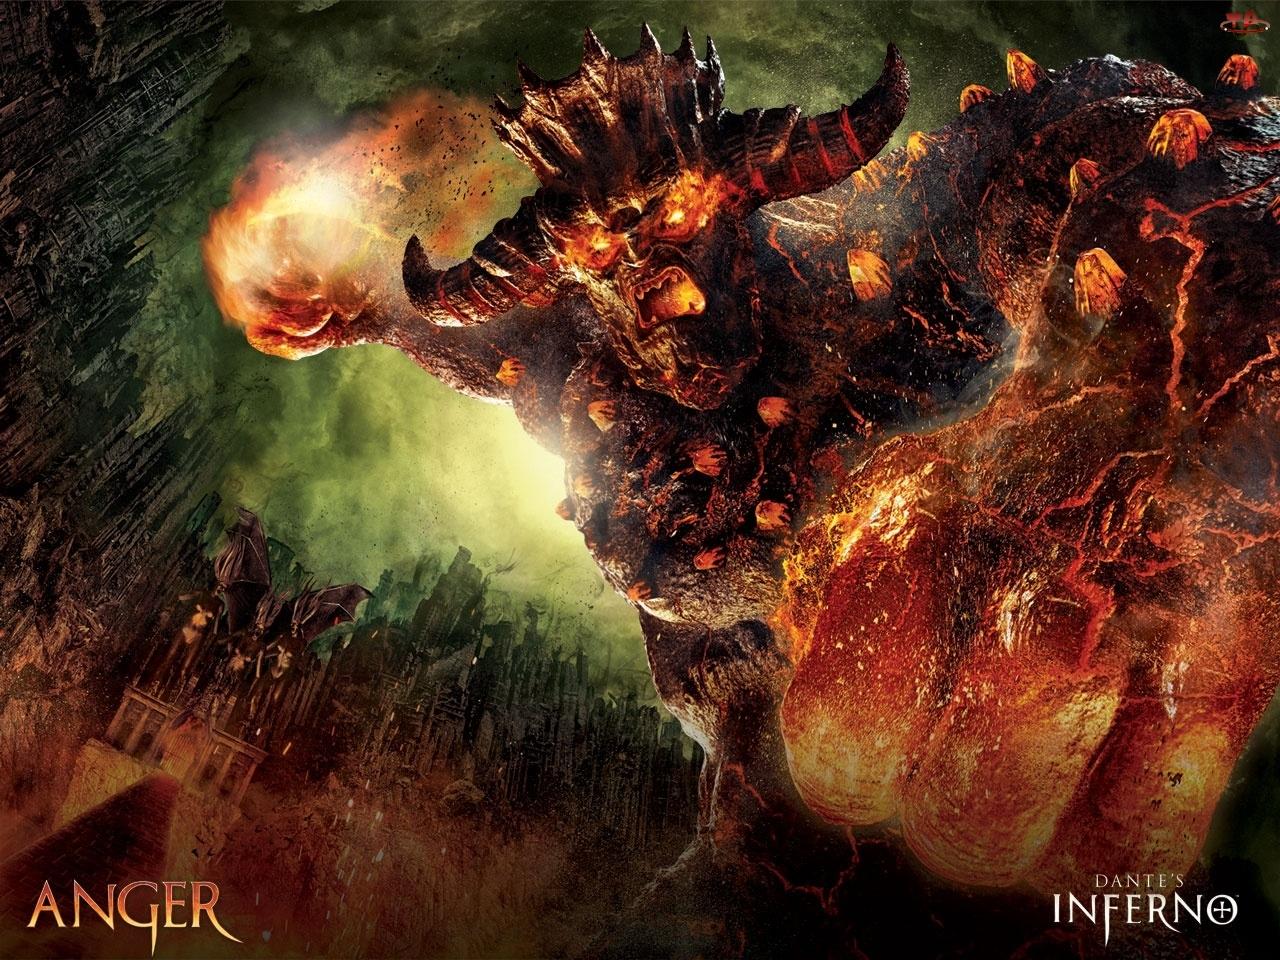 Anger, Dantes Inferno